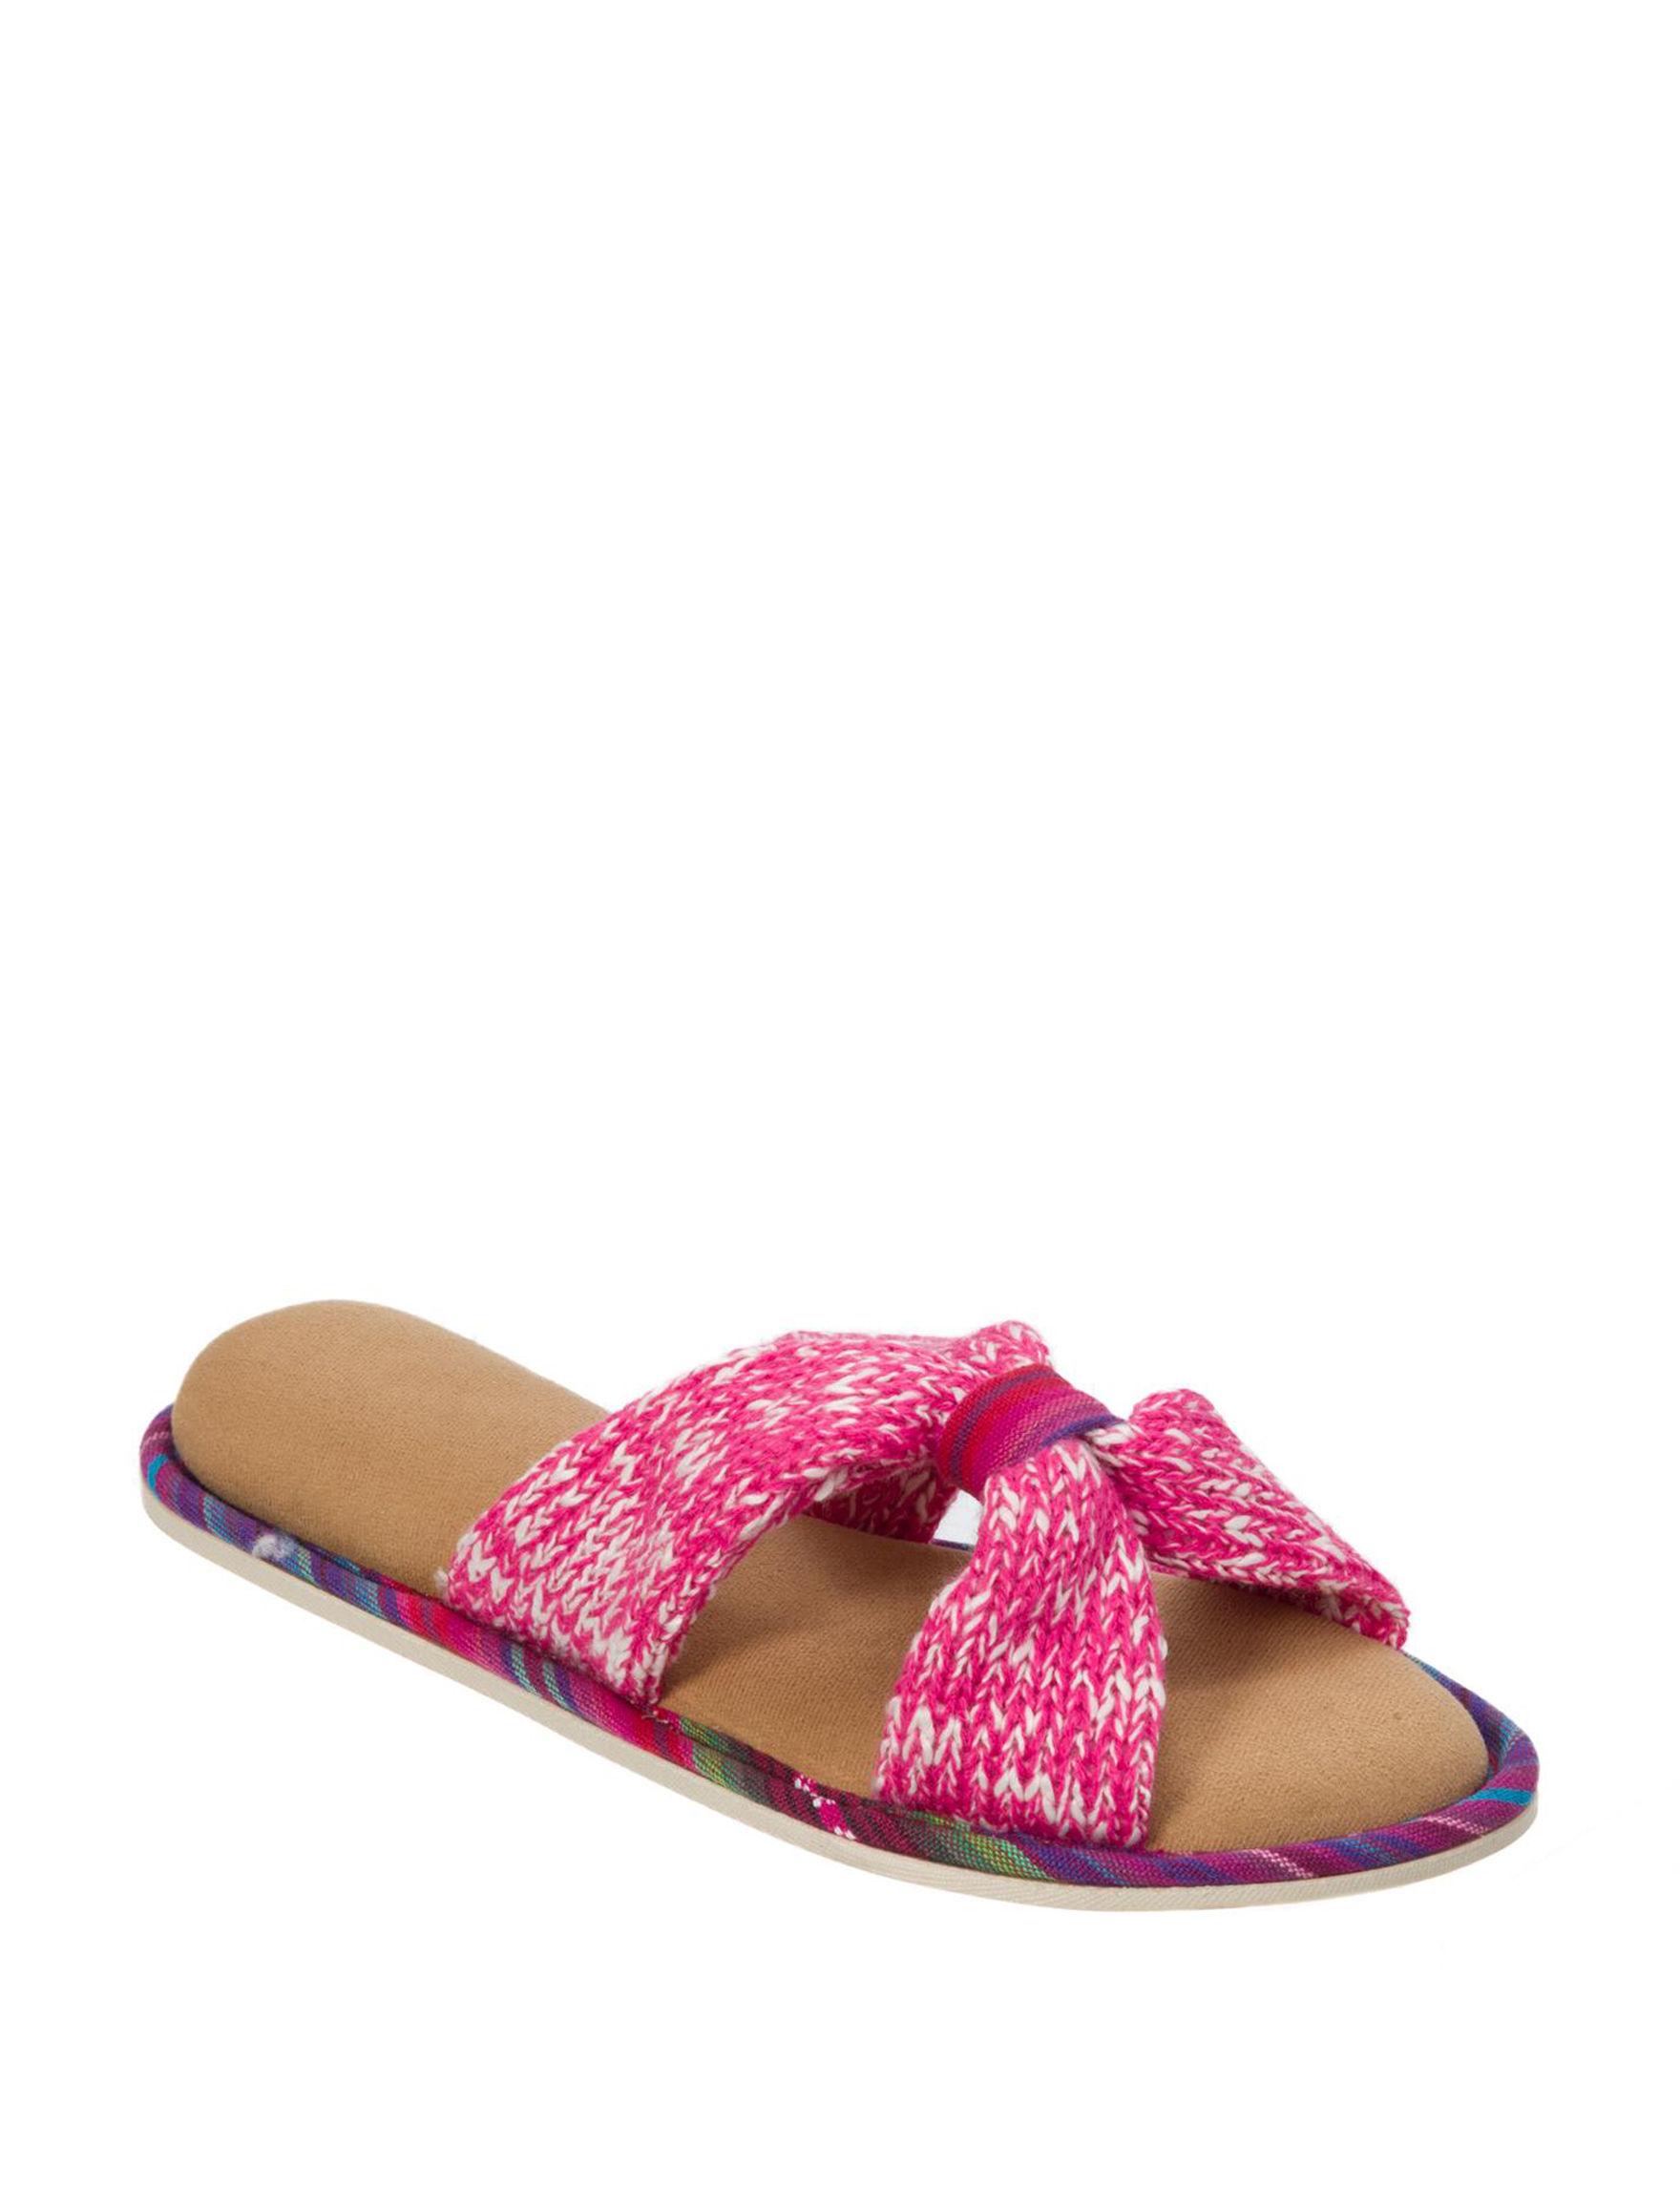 Dearfoams Pink Slipper Sandals